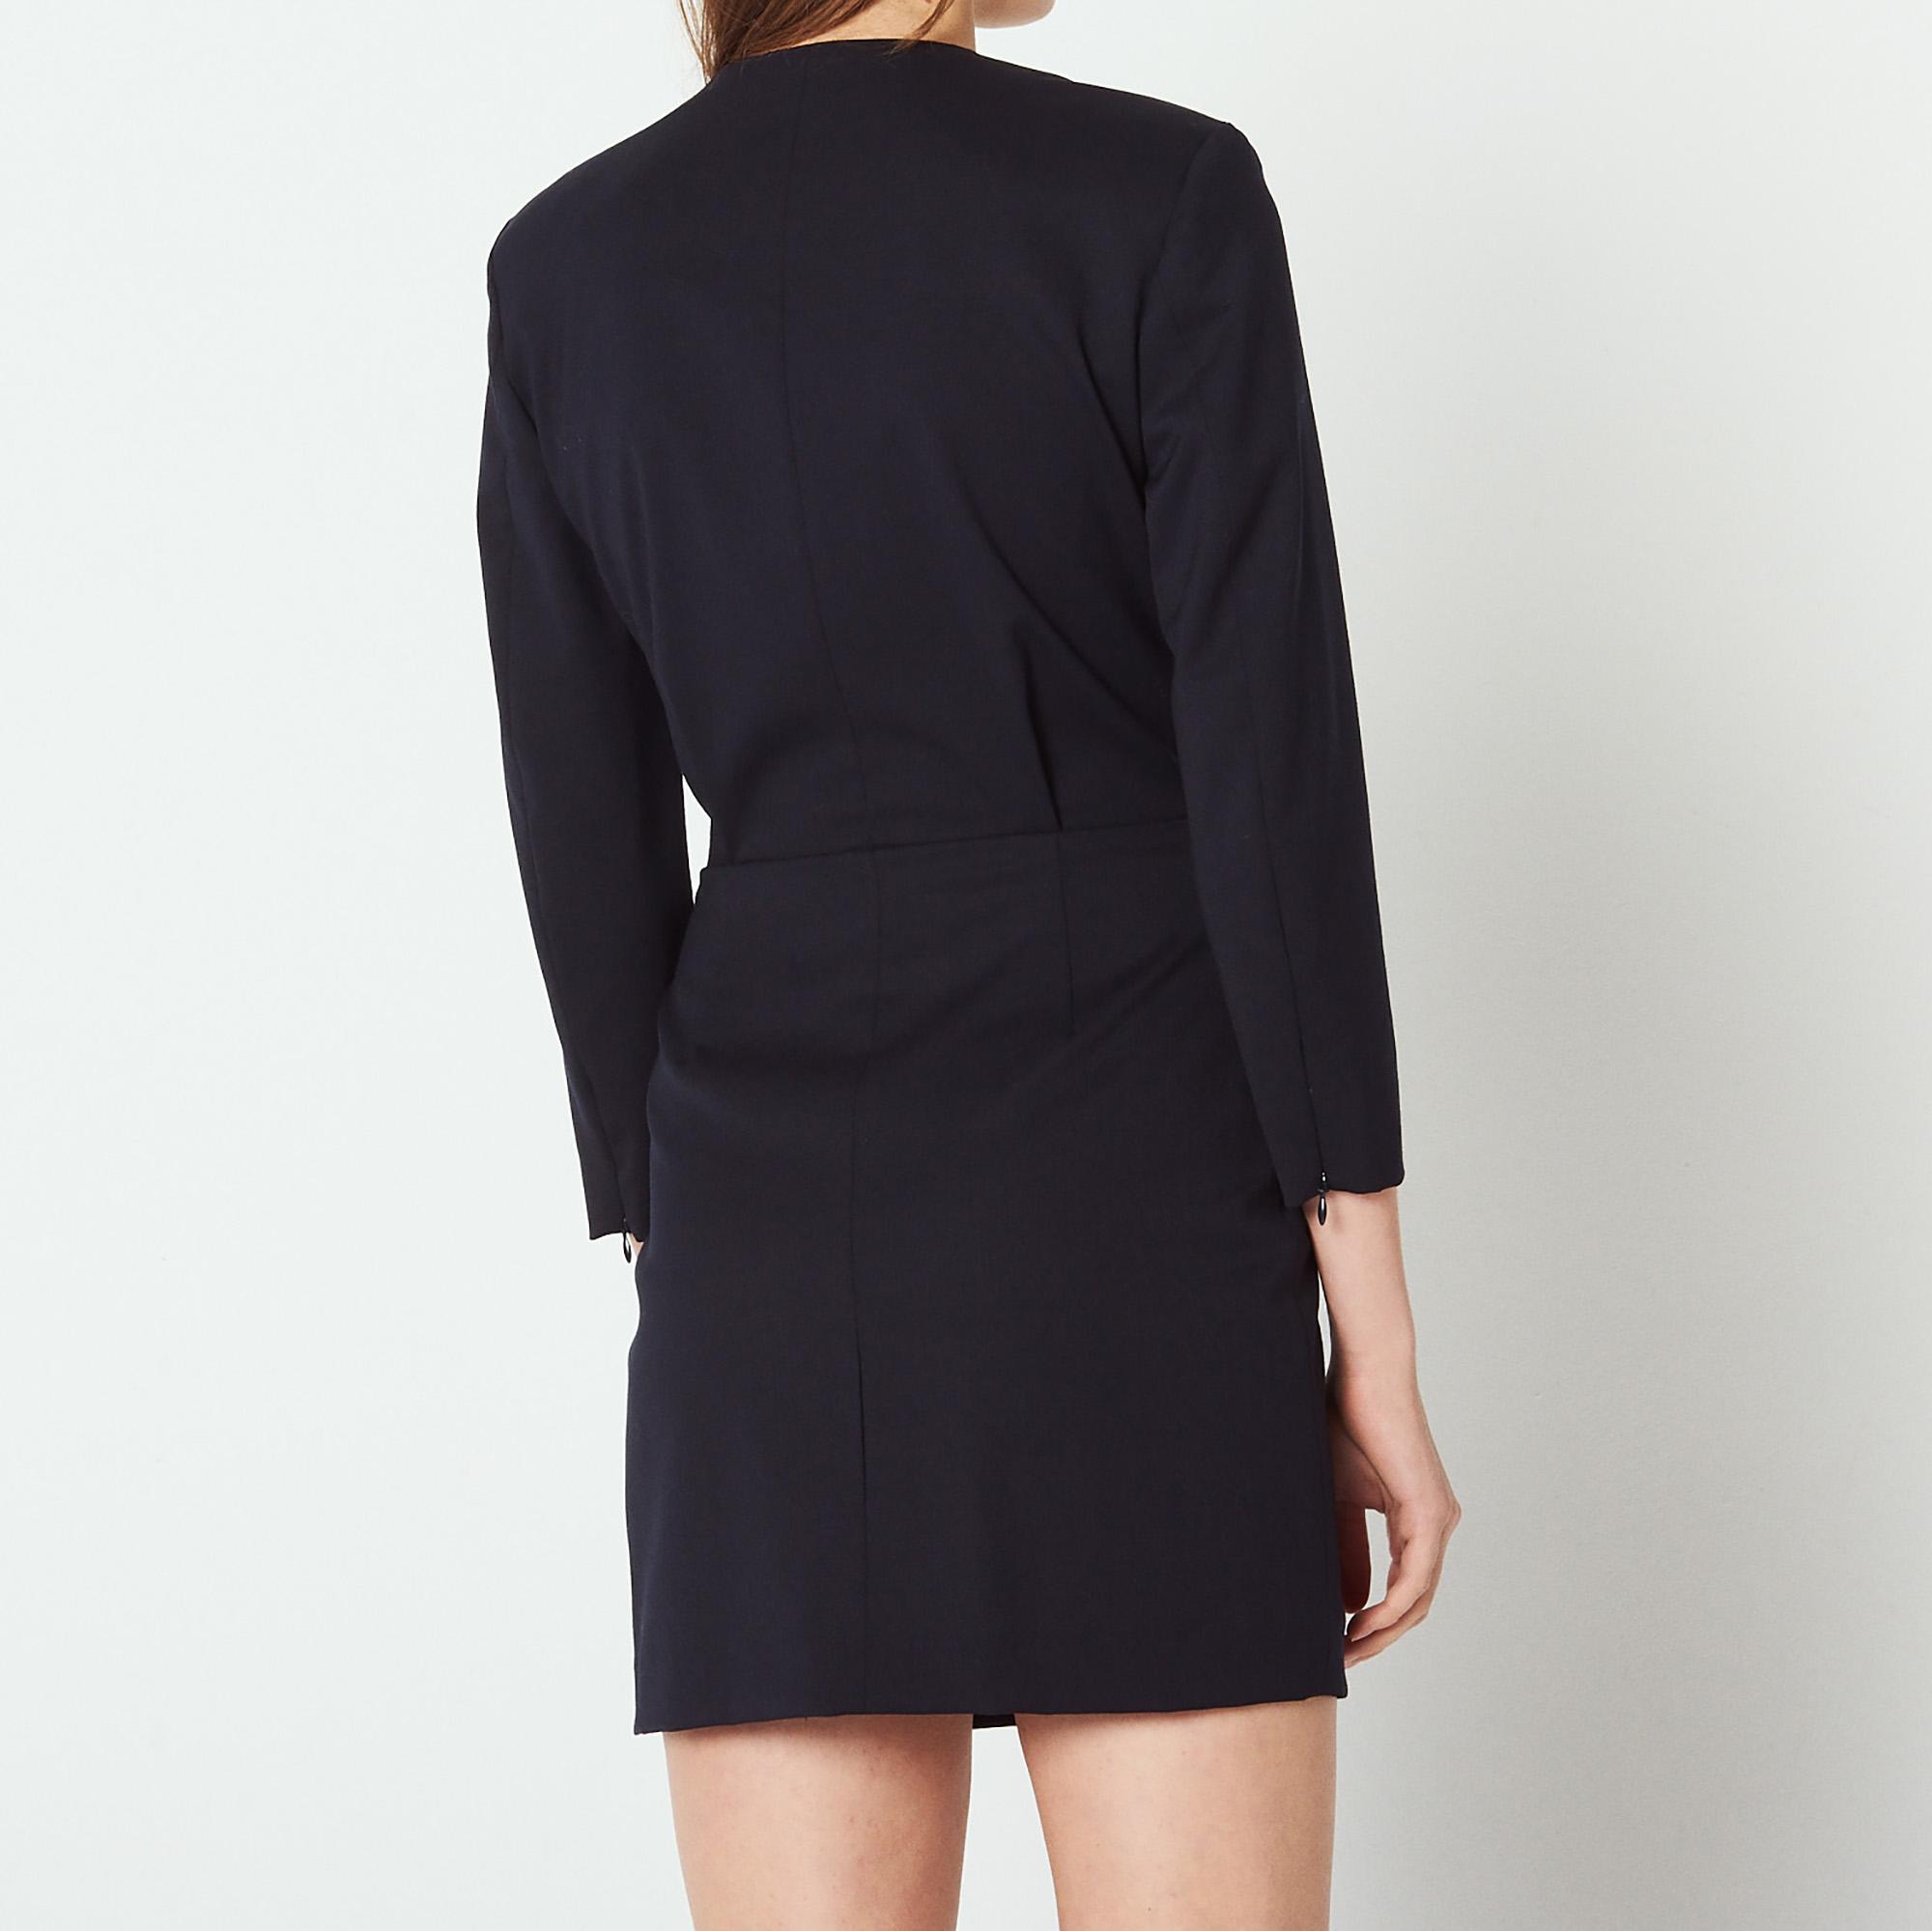 robe courte avec d collet plongeant r20388h robes. Black Bedroom Furniture Sets. Home Design Ideas